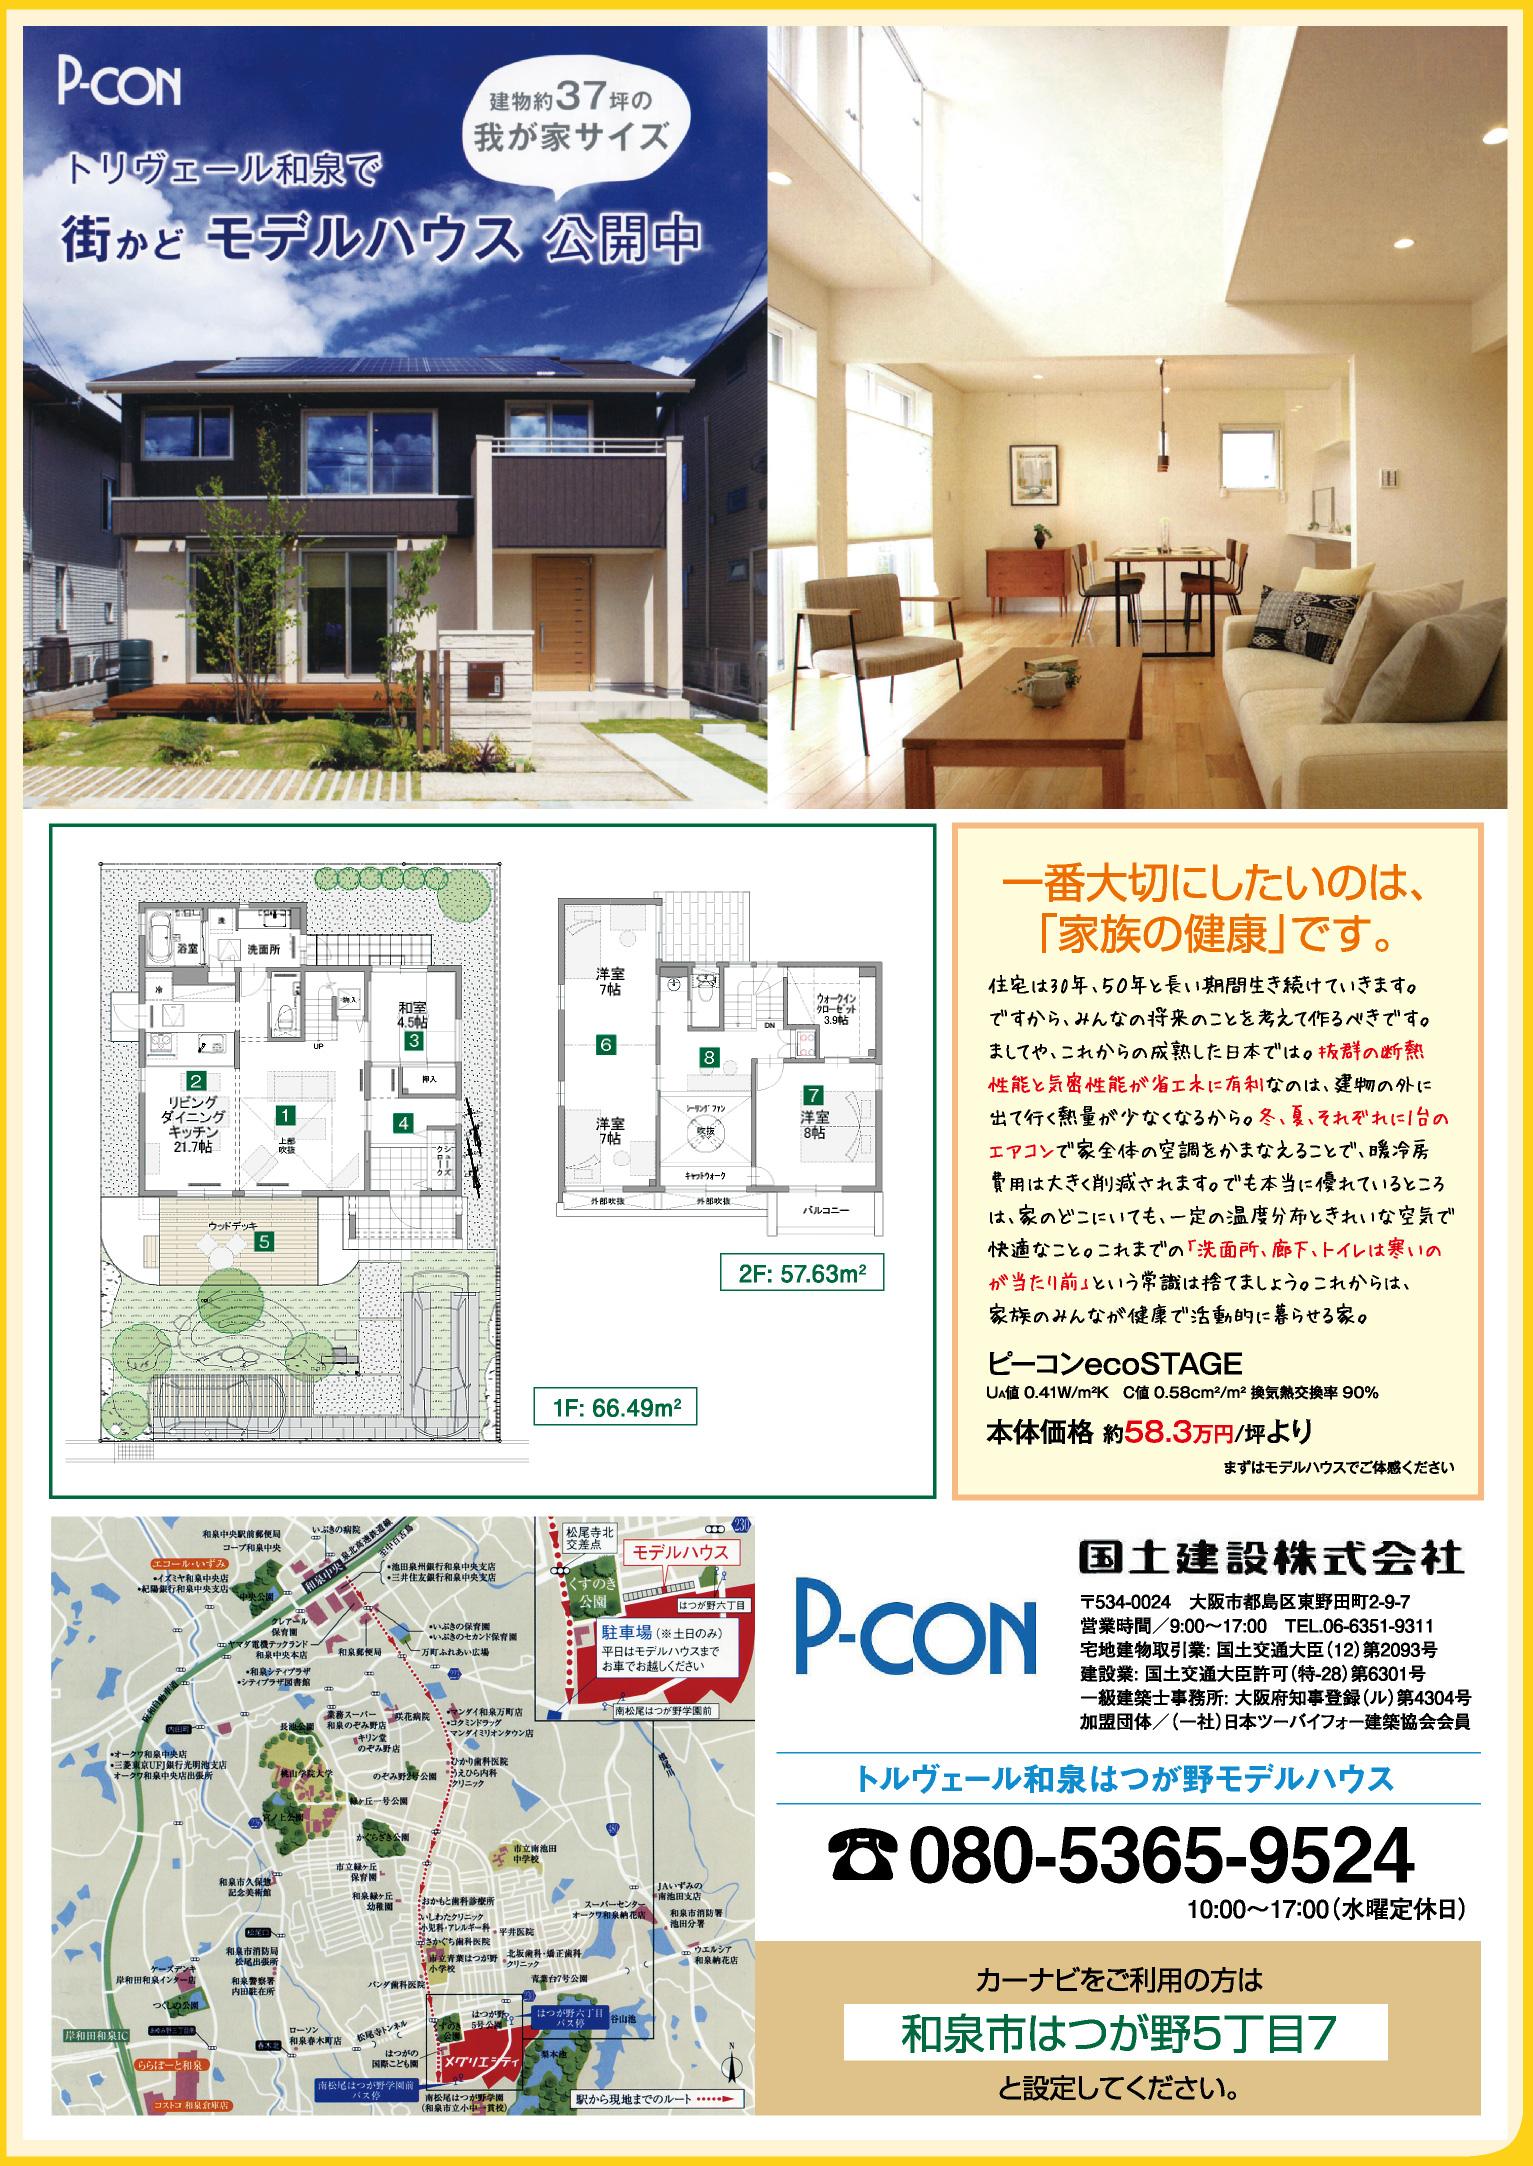 P-con(ピーコン) 国土建設株式会社